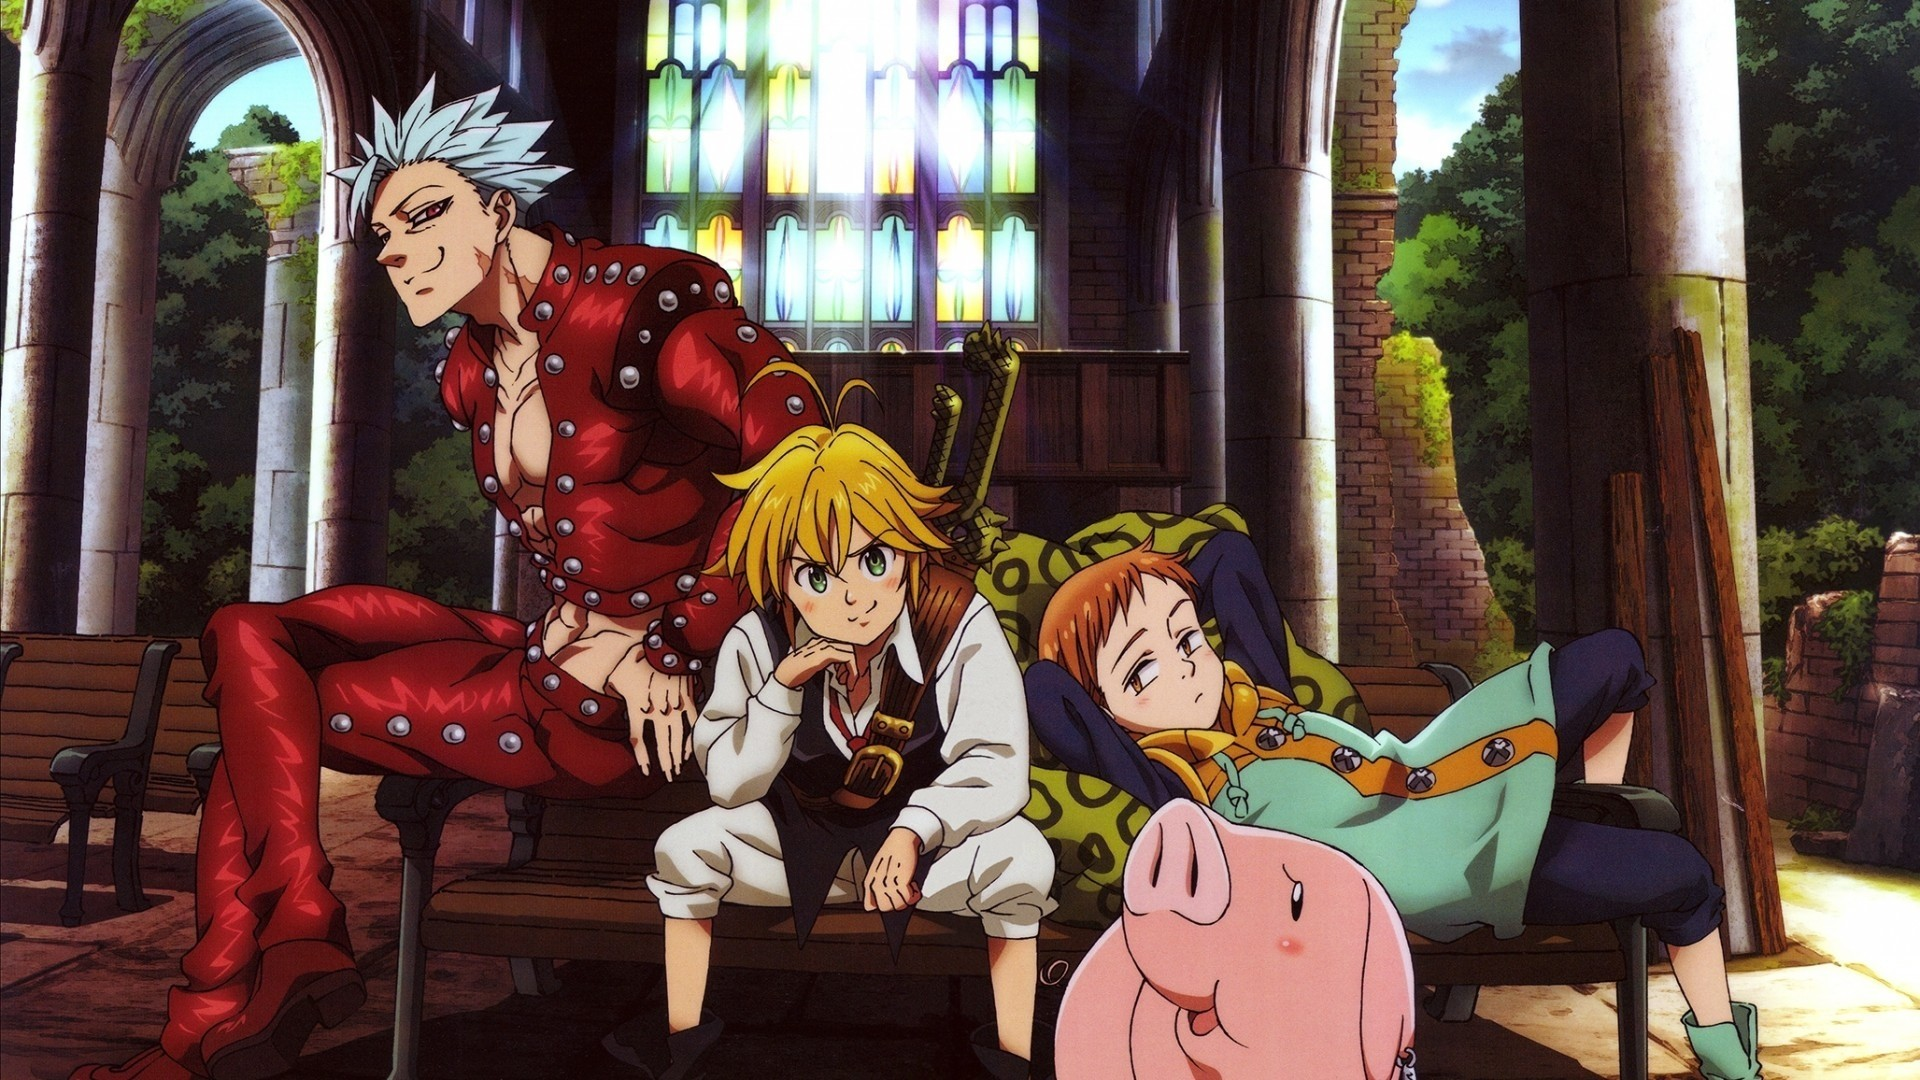 Seven Deadly Sins hd wallpaper download